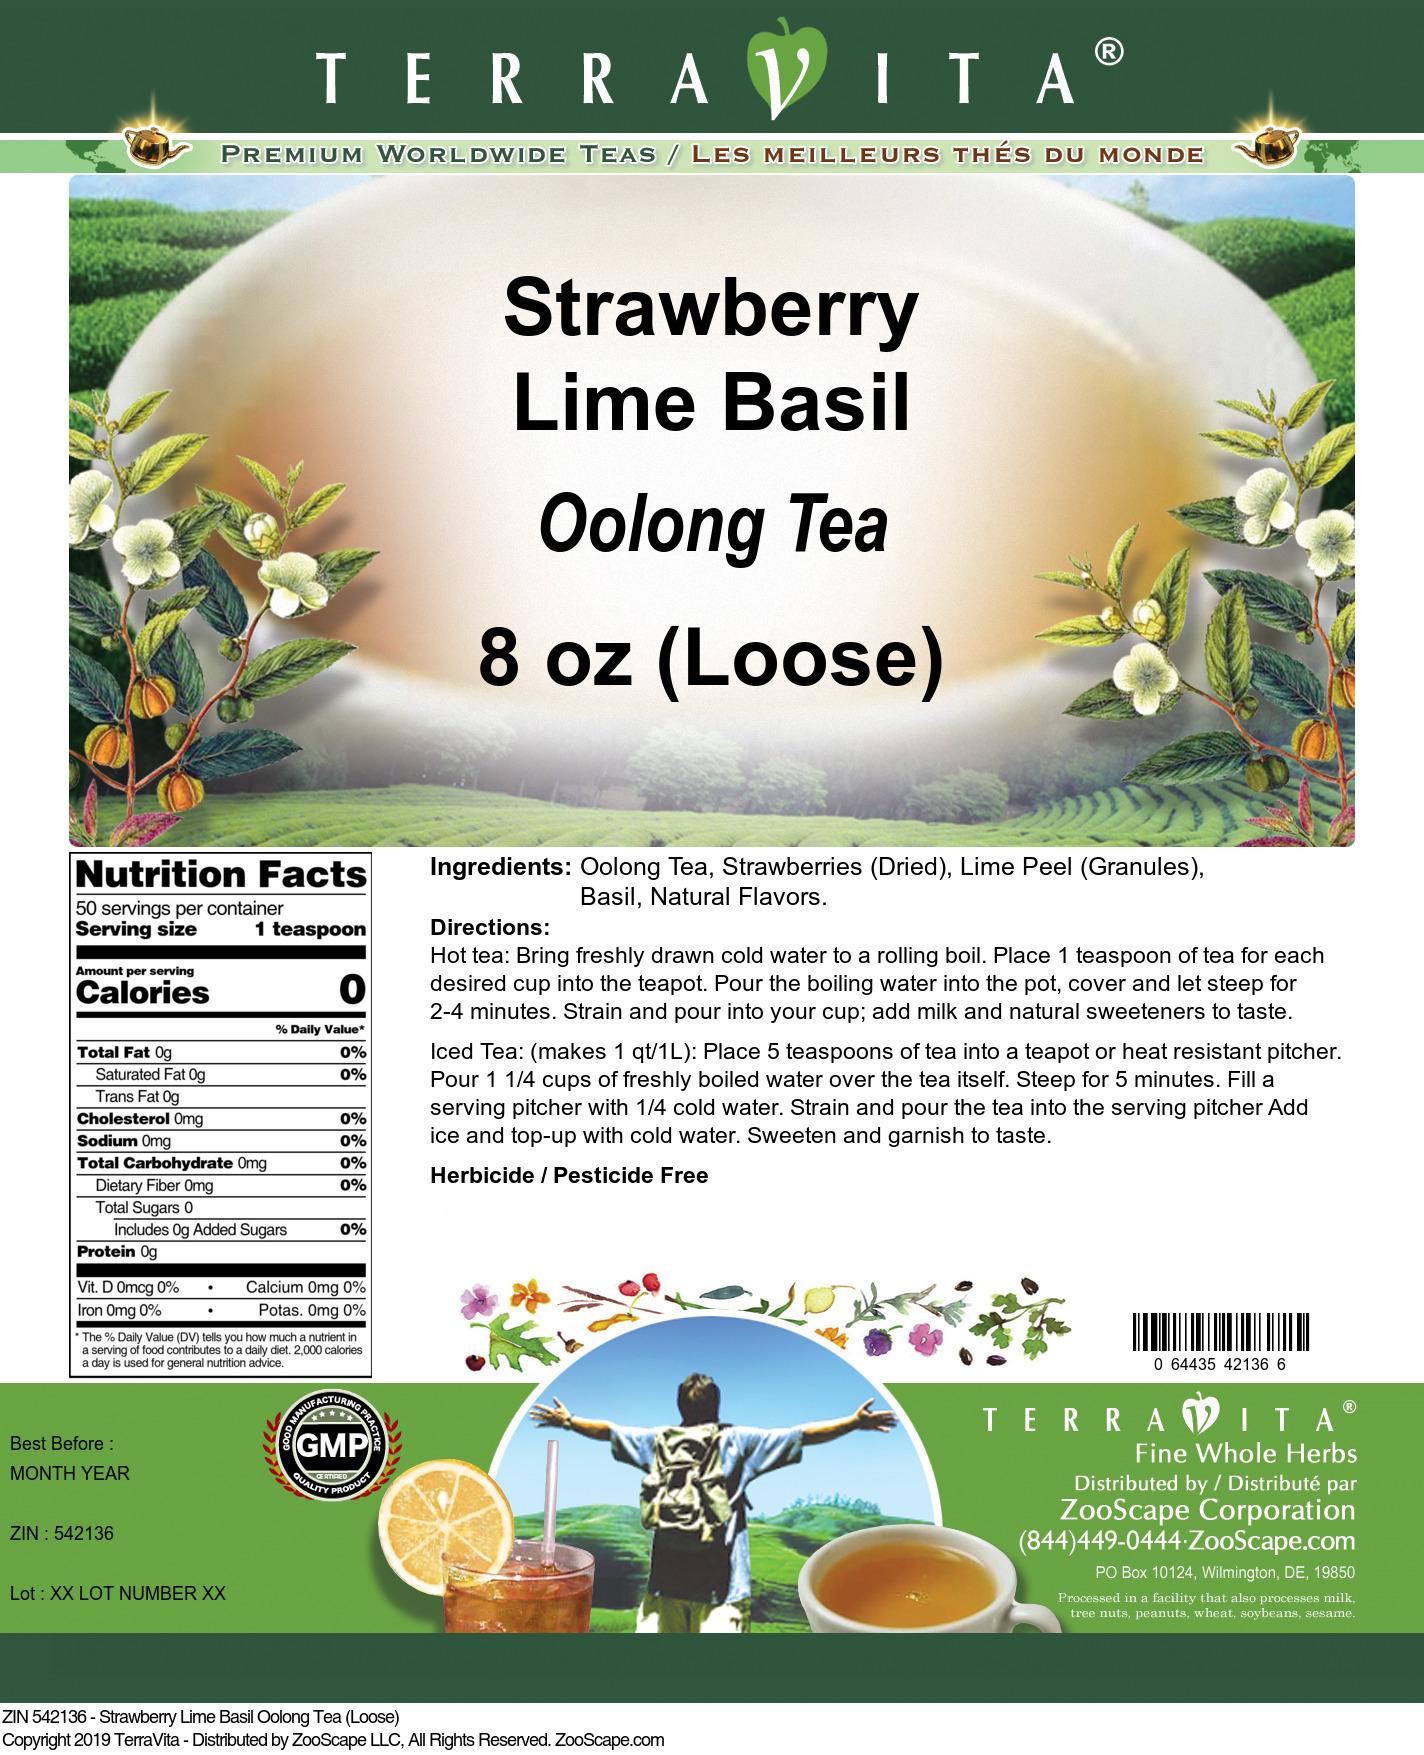 Strawberry Lime Basil Oolong Tea (Loose)